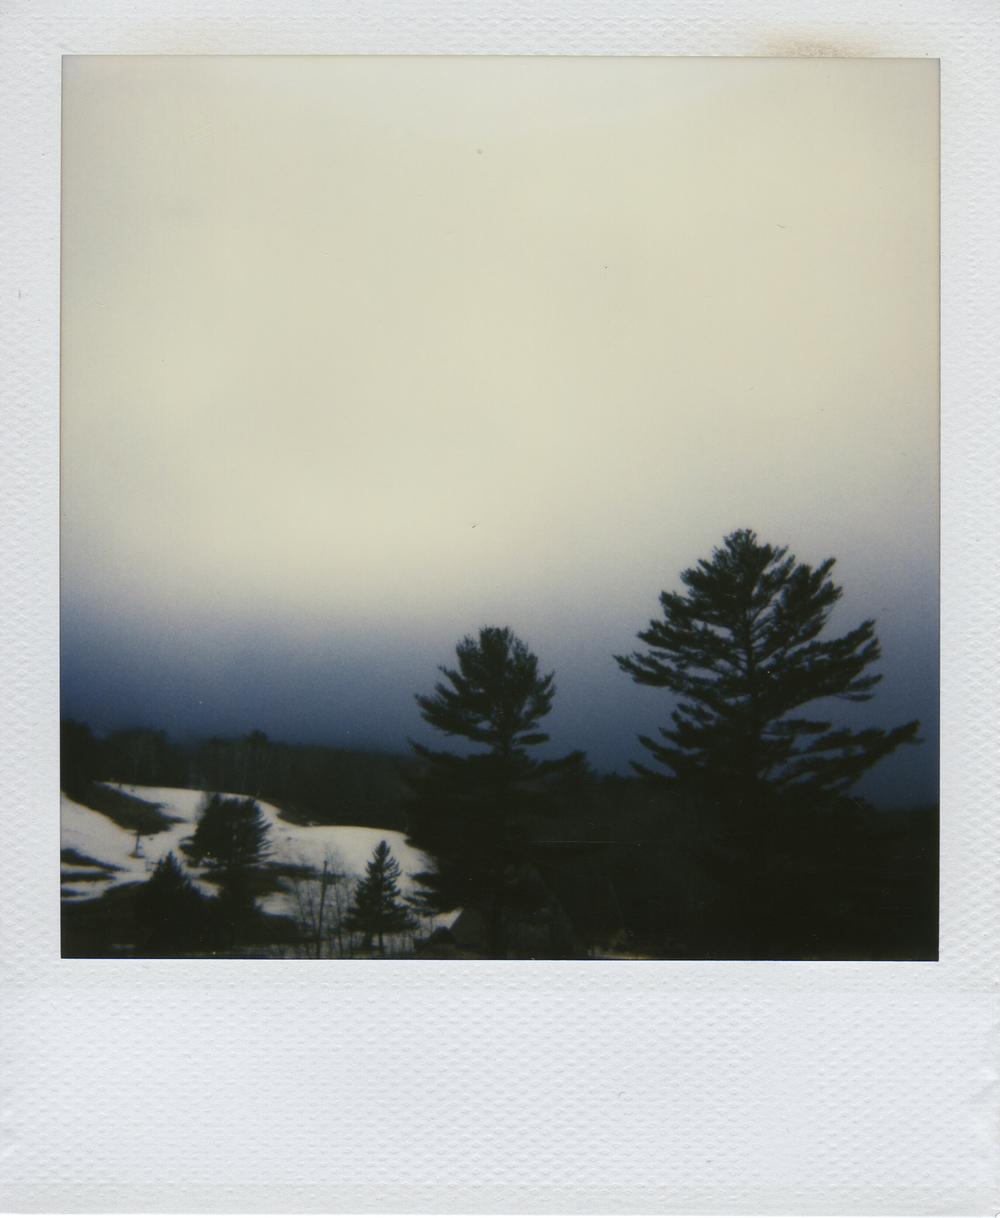 jlaurence-polaroid-127.jpg